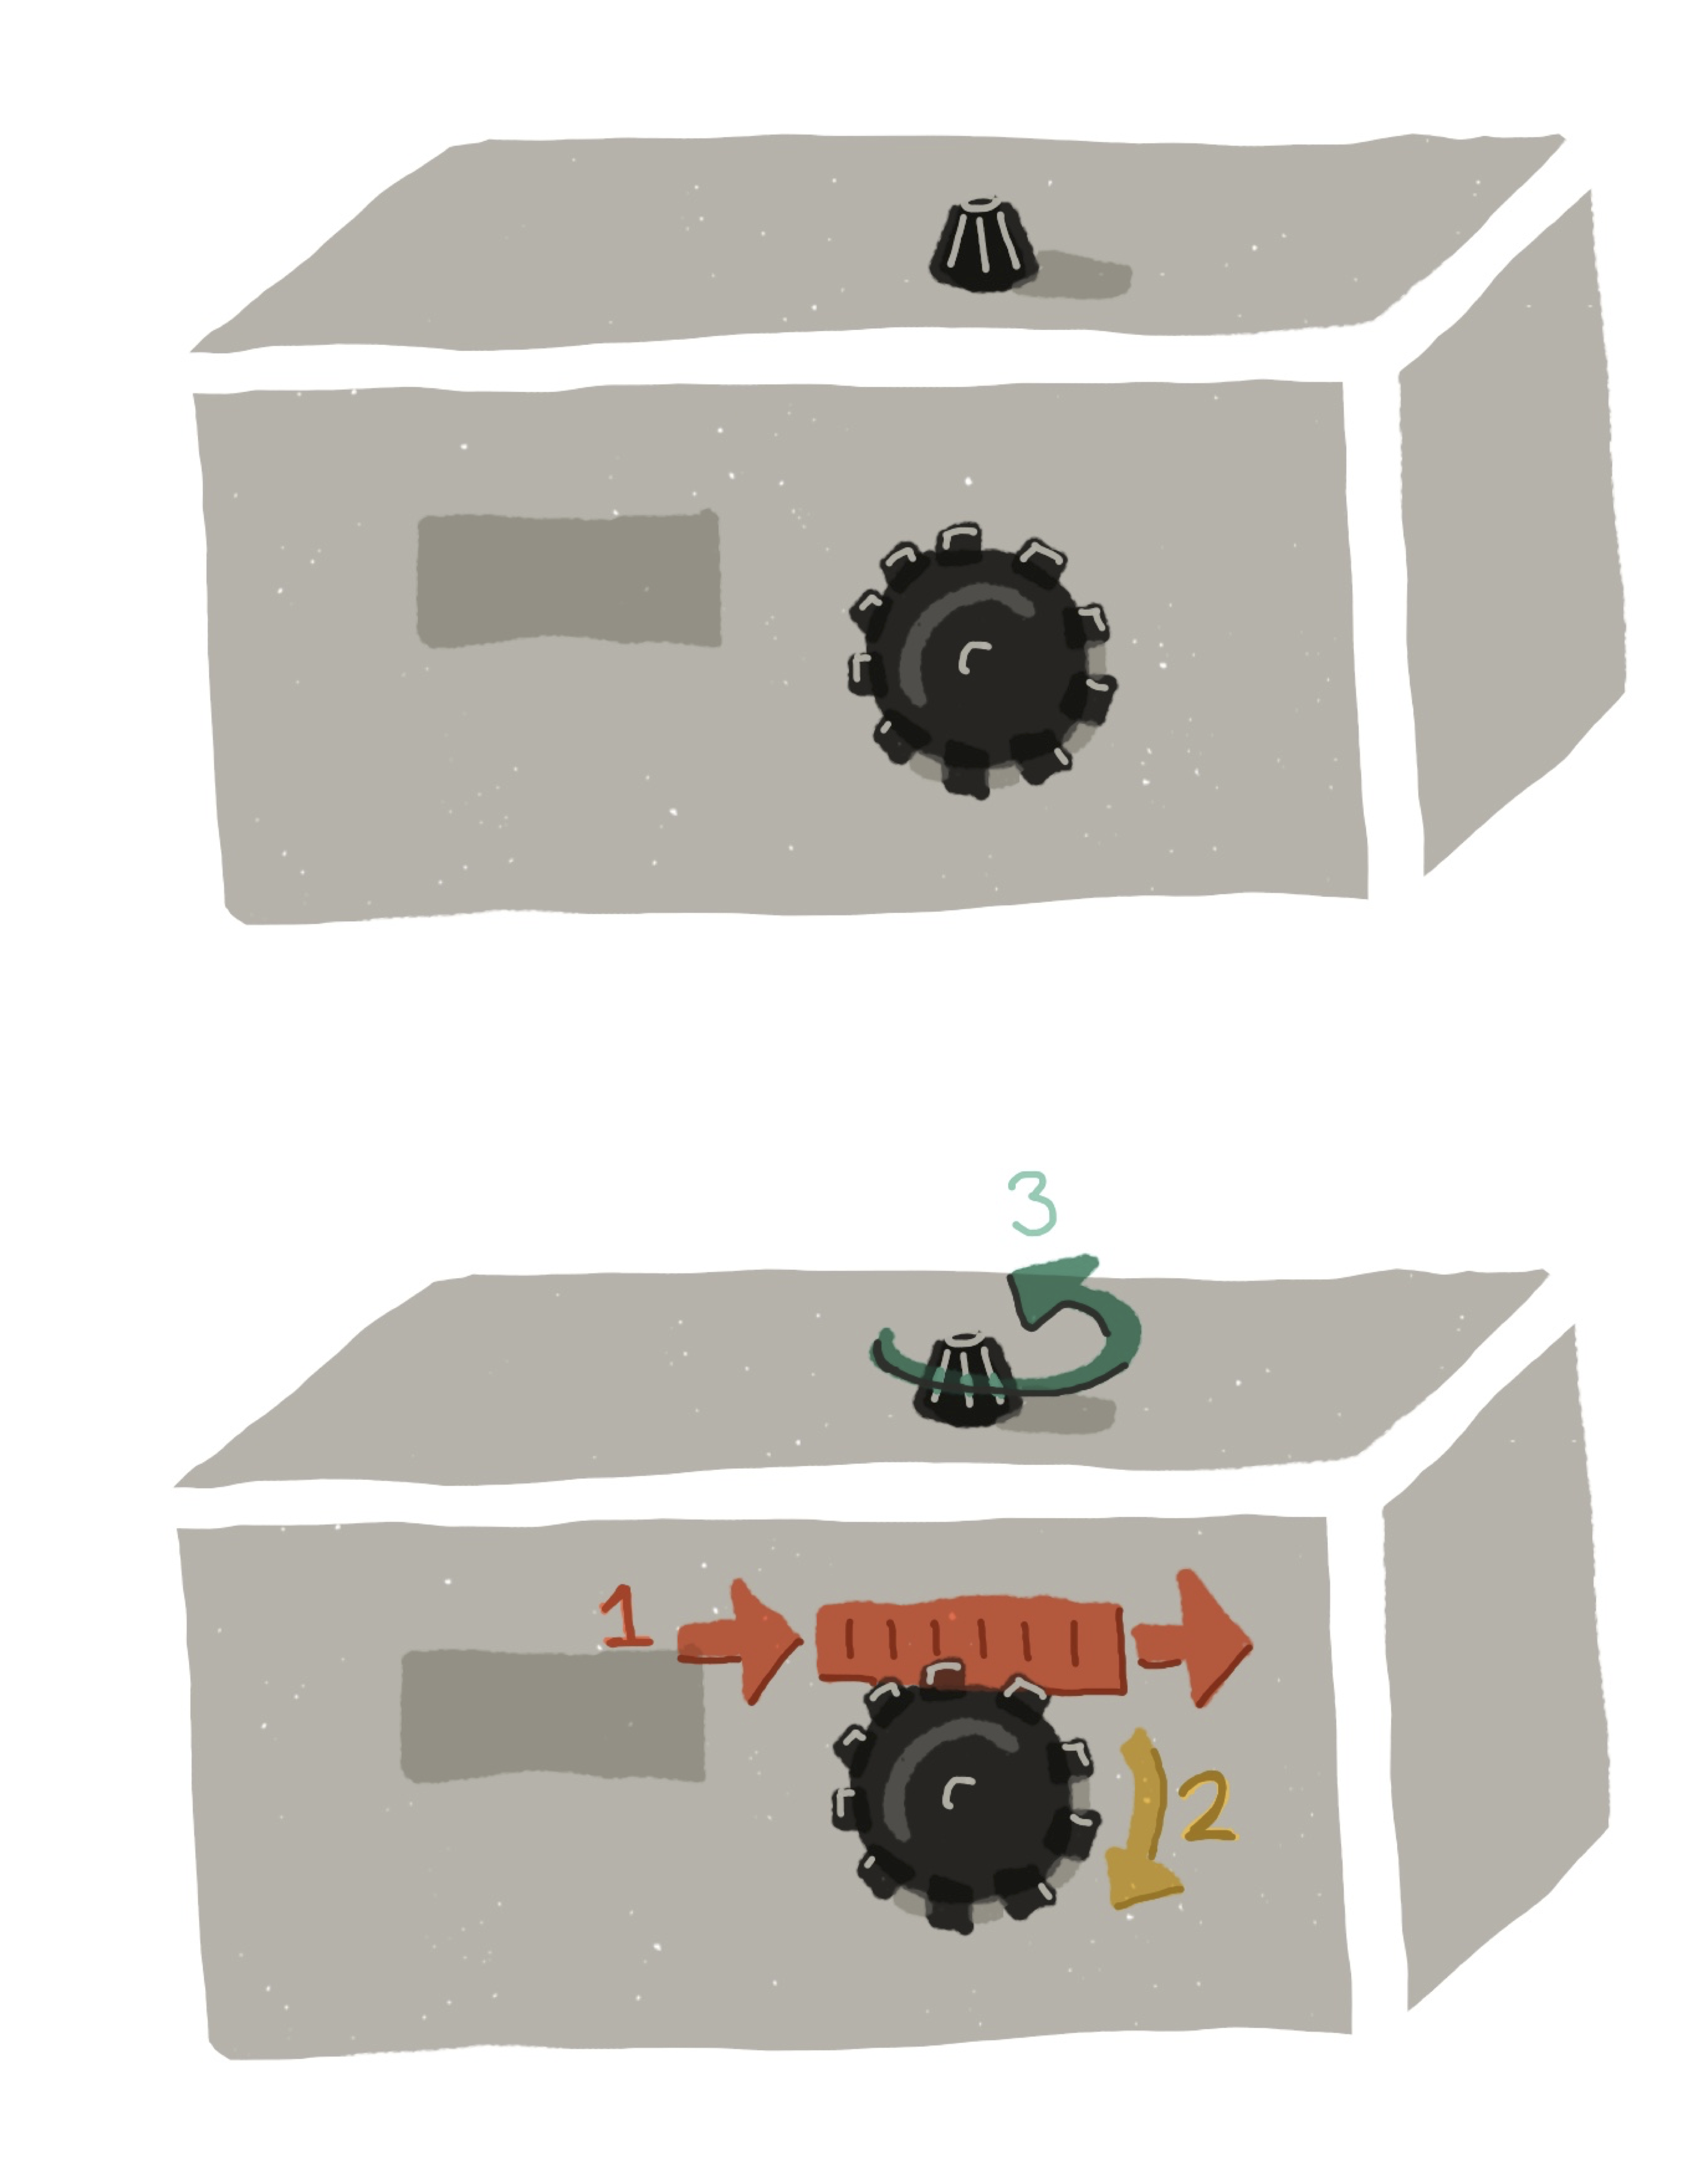 shelf-with-gear-interface